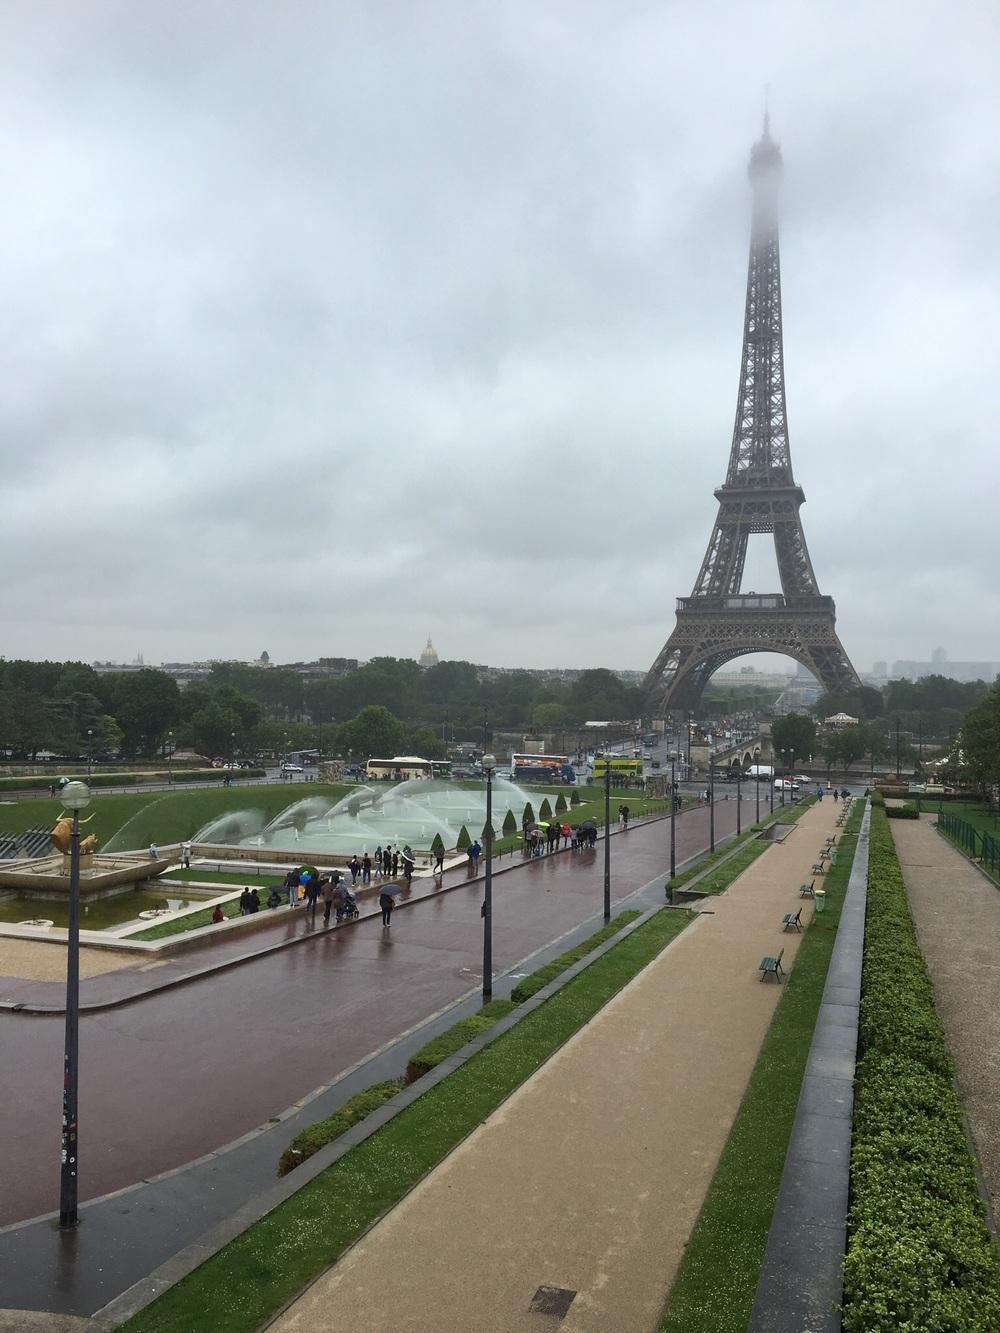 Tour d'Eiffel from Trocadero Fountains